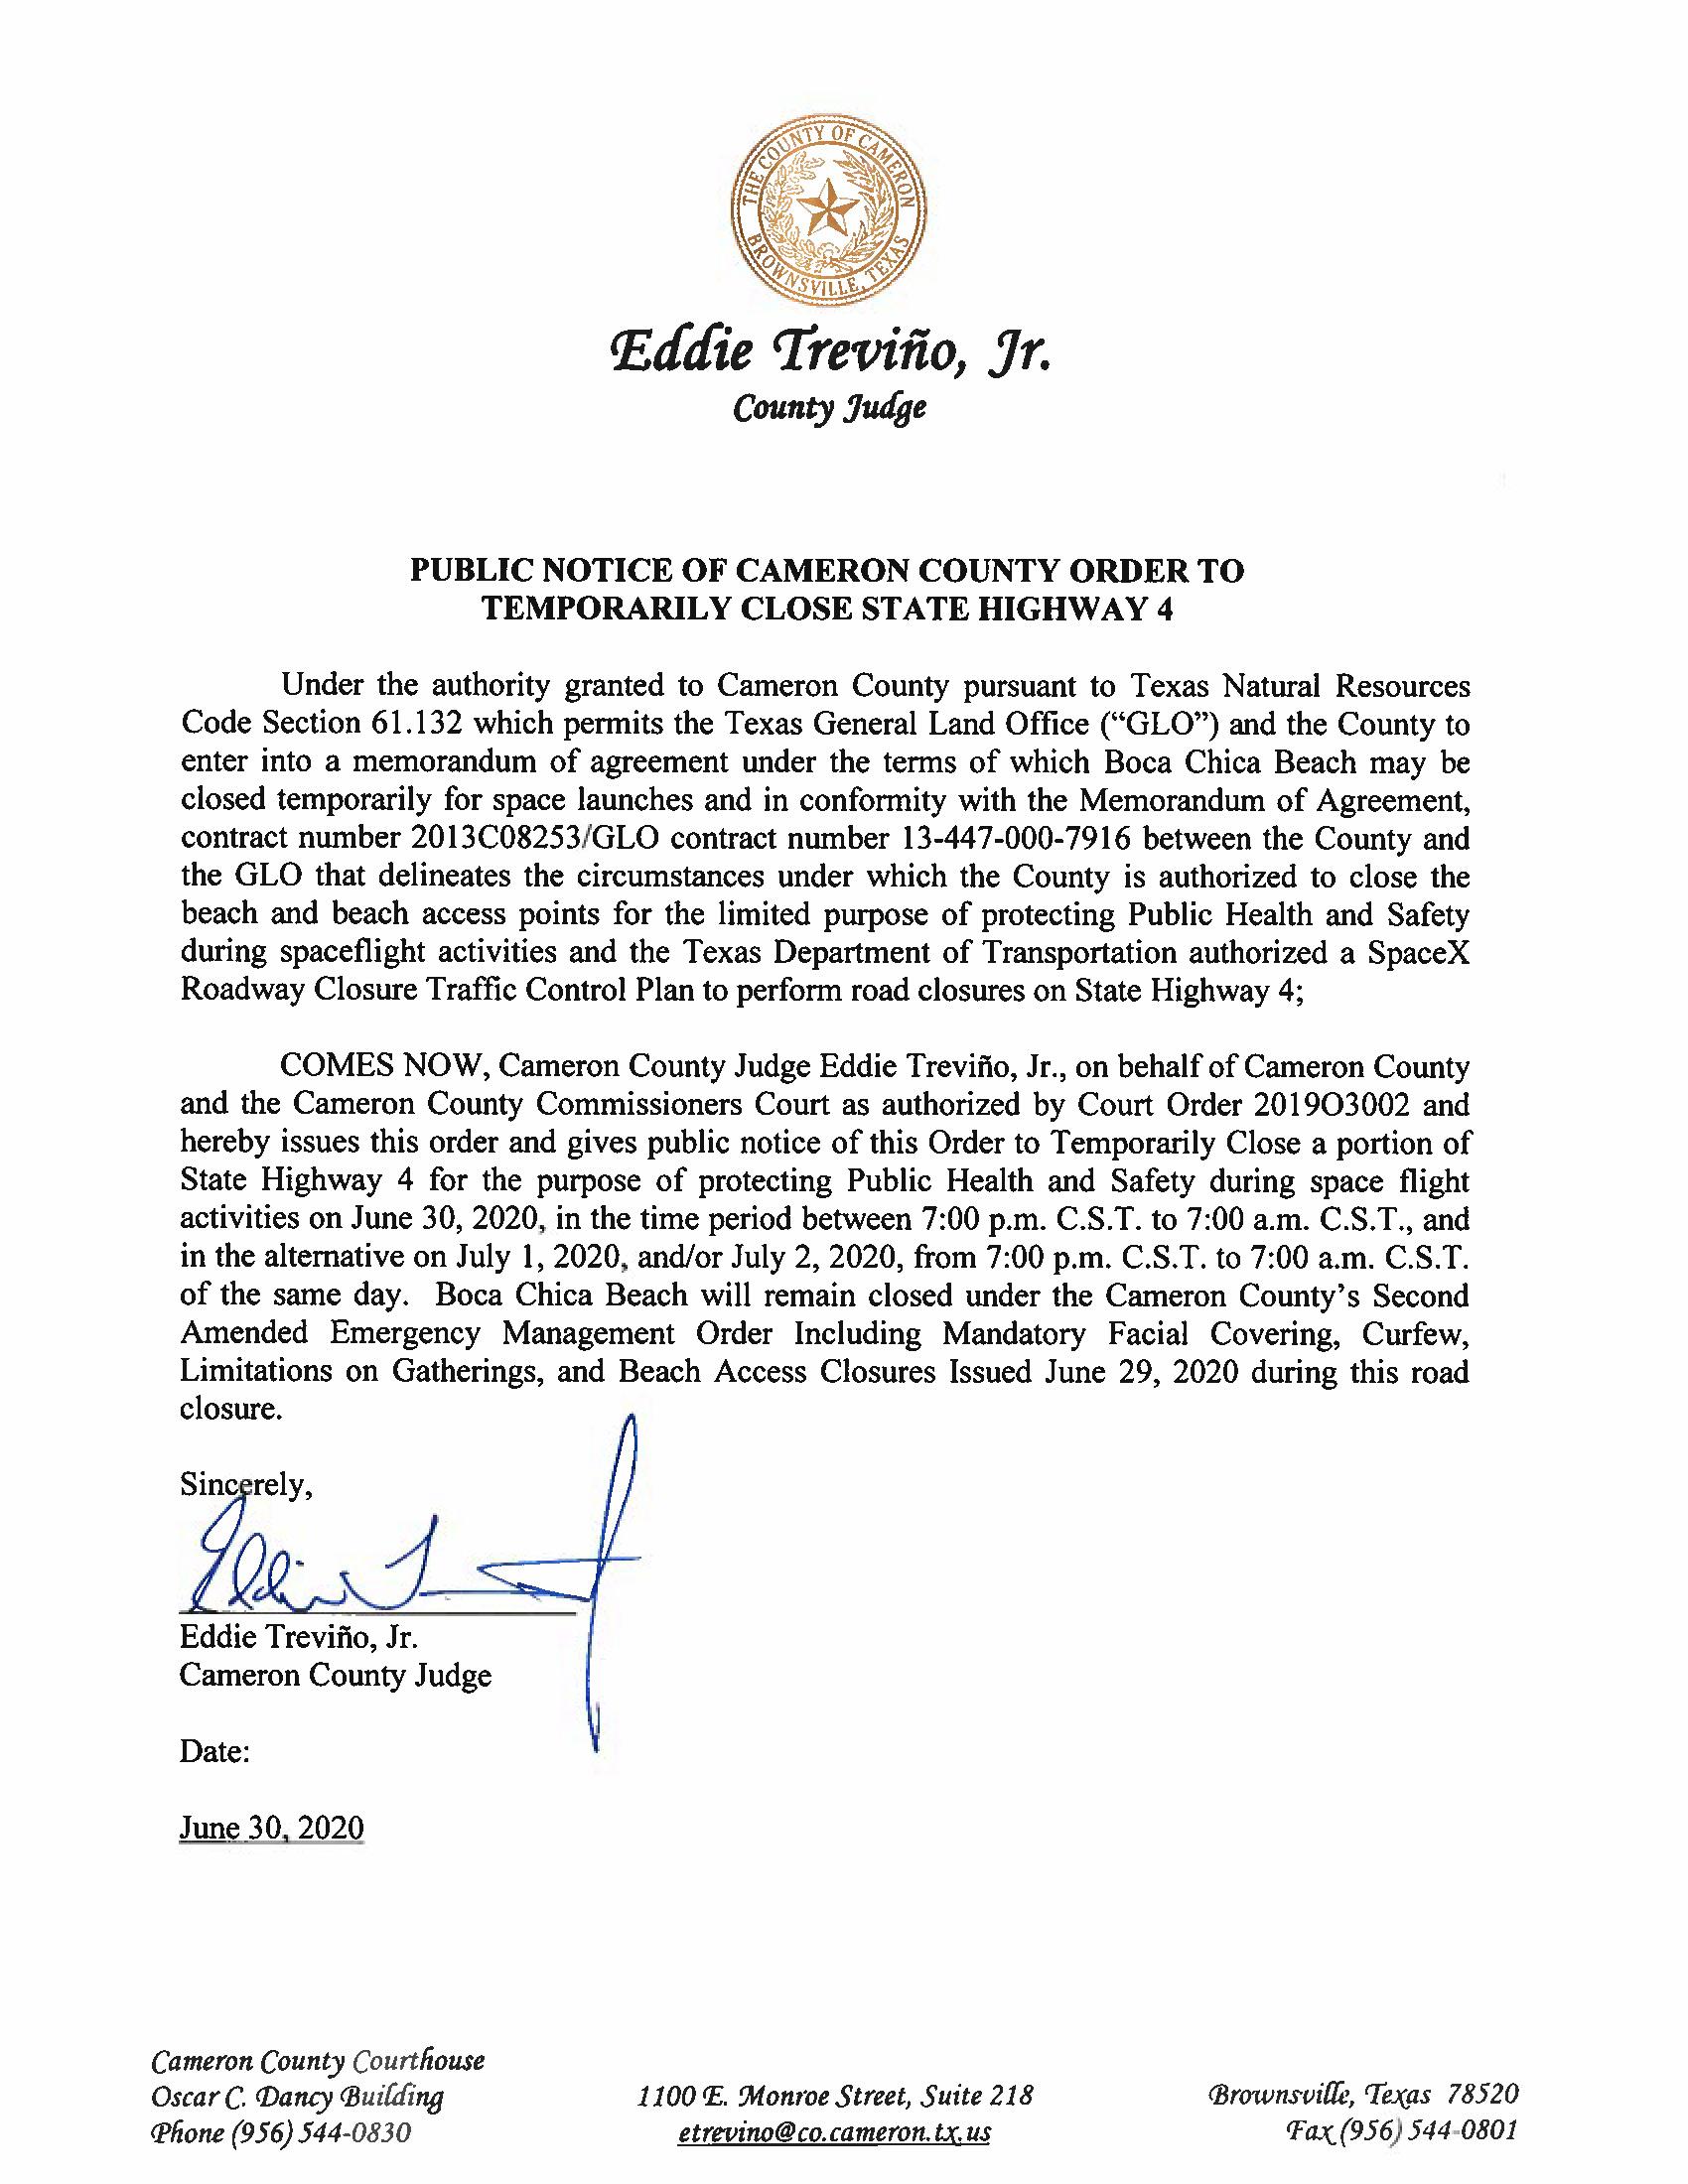 PUBLIC NOTICE OF CAMERON COUNTY ORDER TO TEMP. ROAD CLOSURE. 06.30.20 Page 1